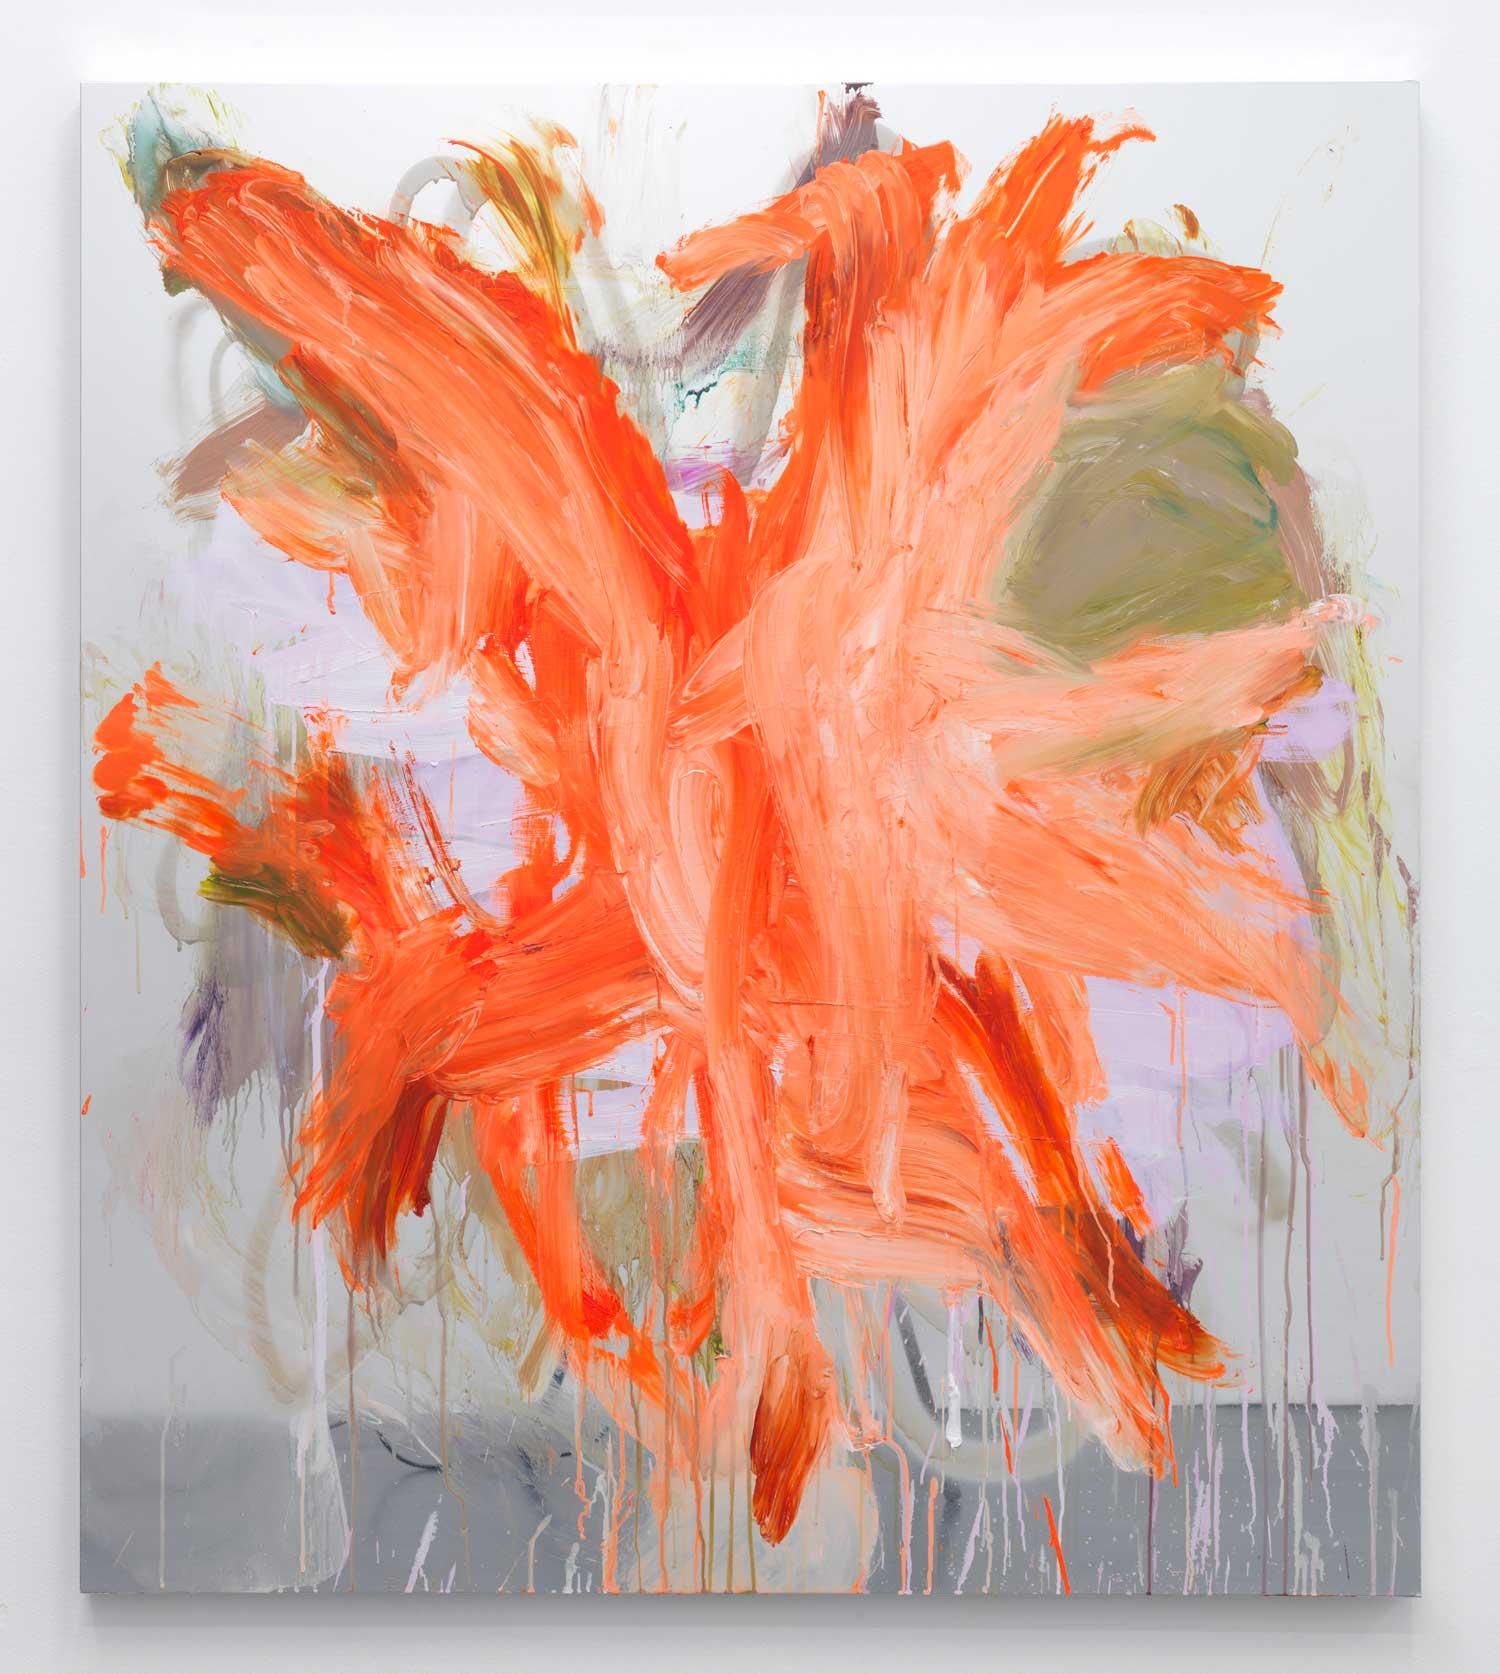 Peter Bonde Art at Natalia Hug | Yellowtrace